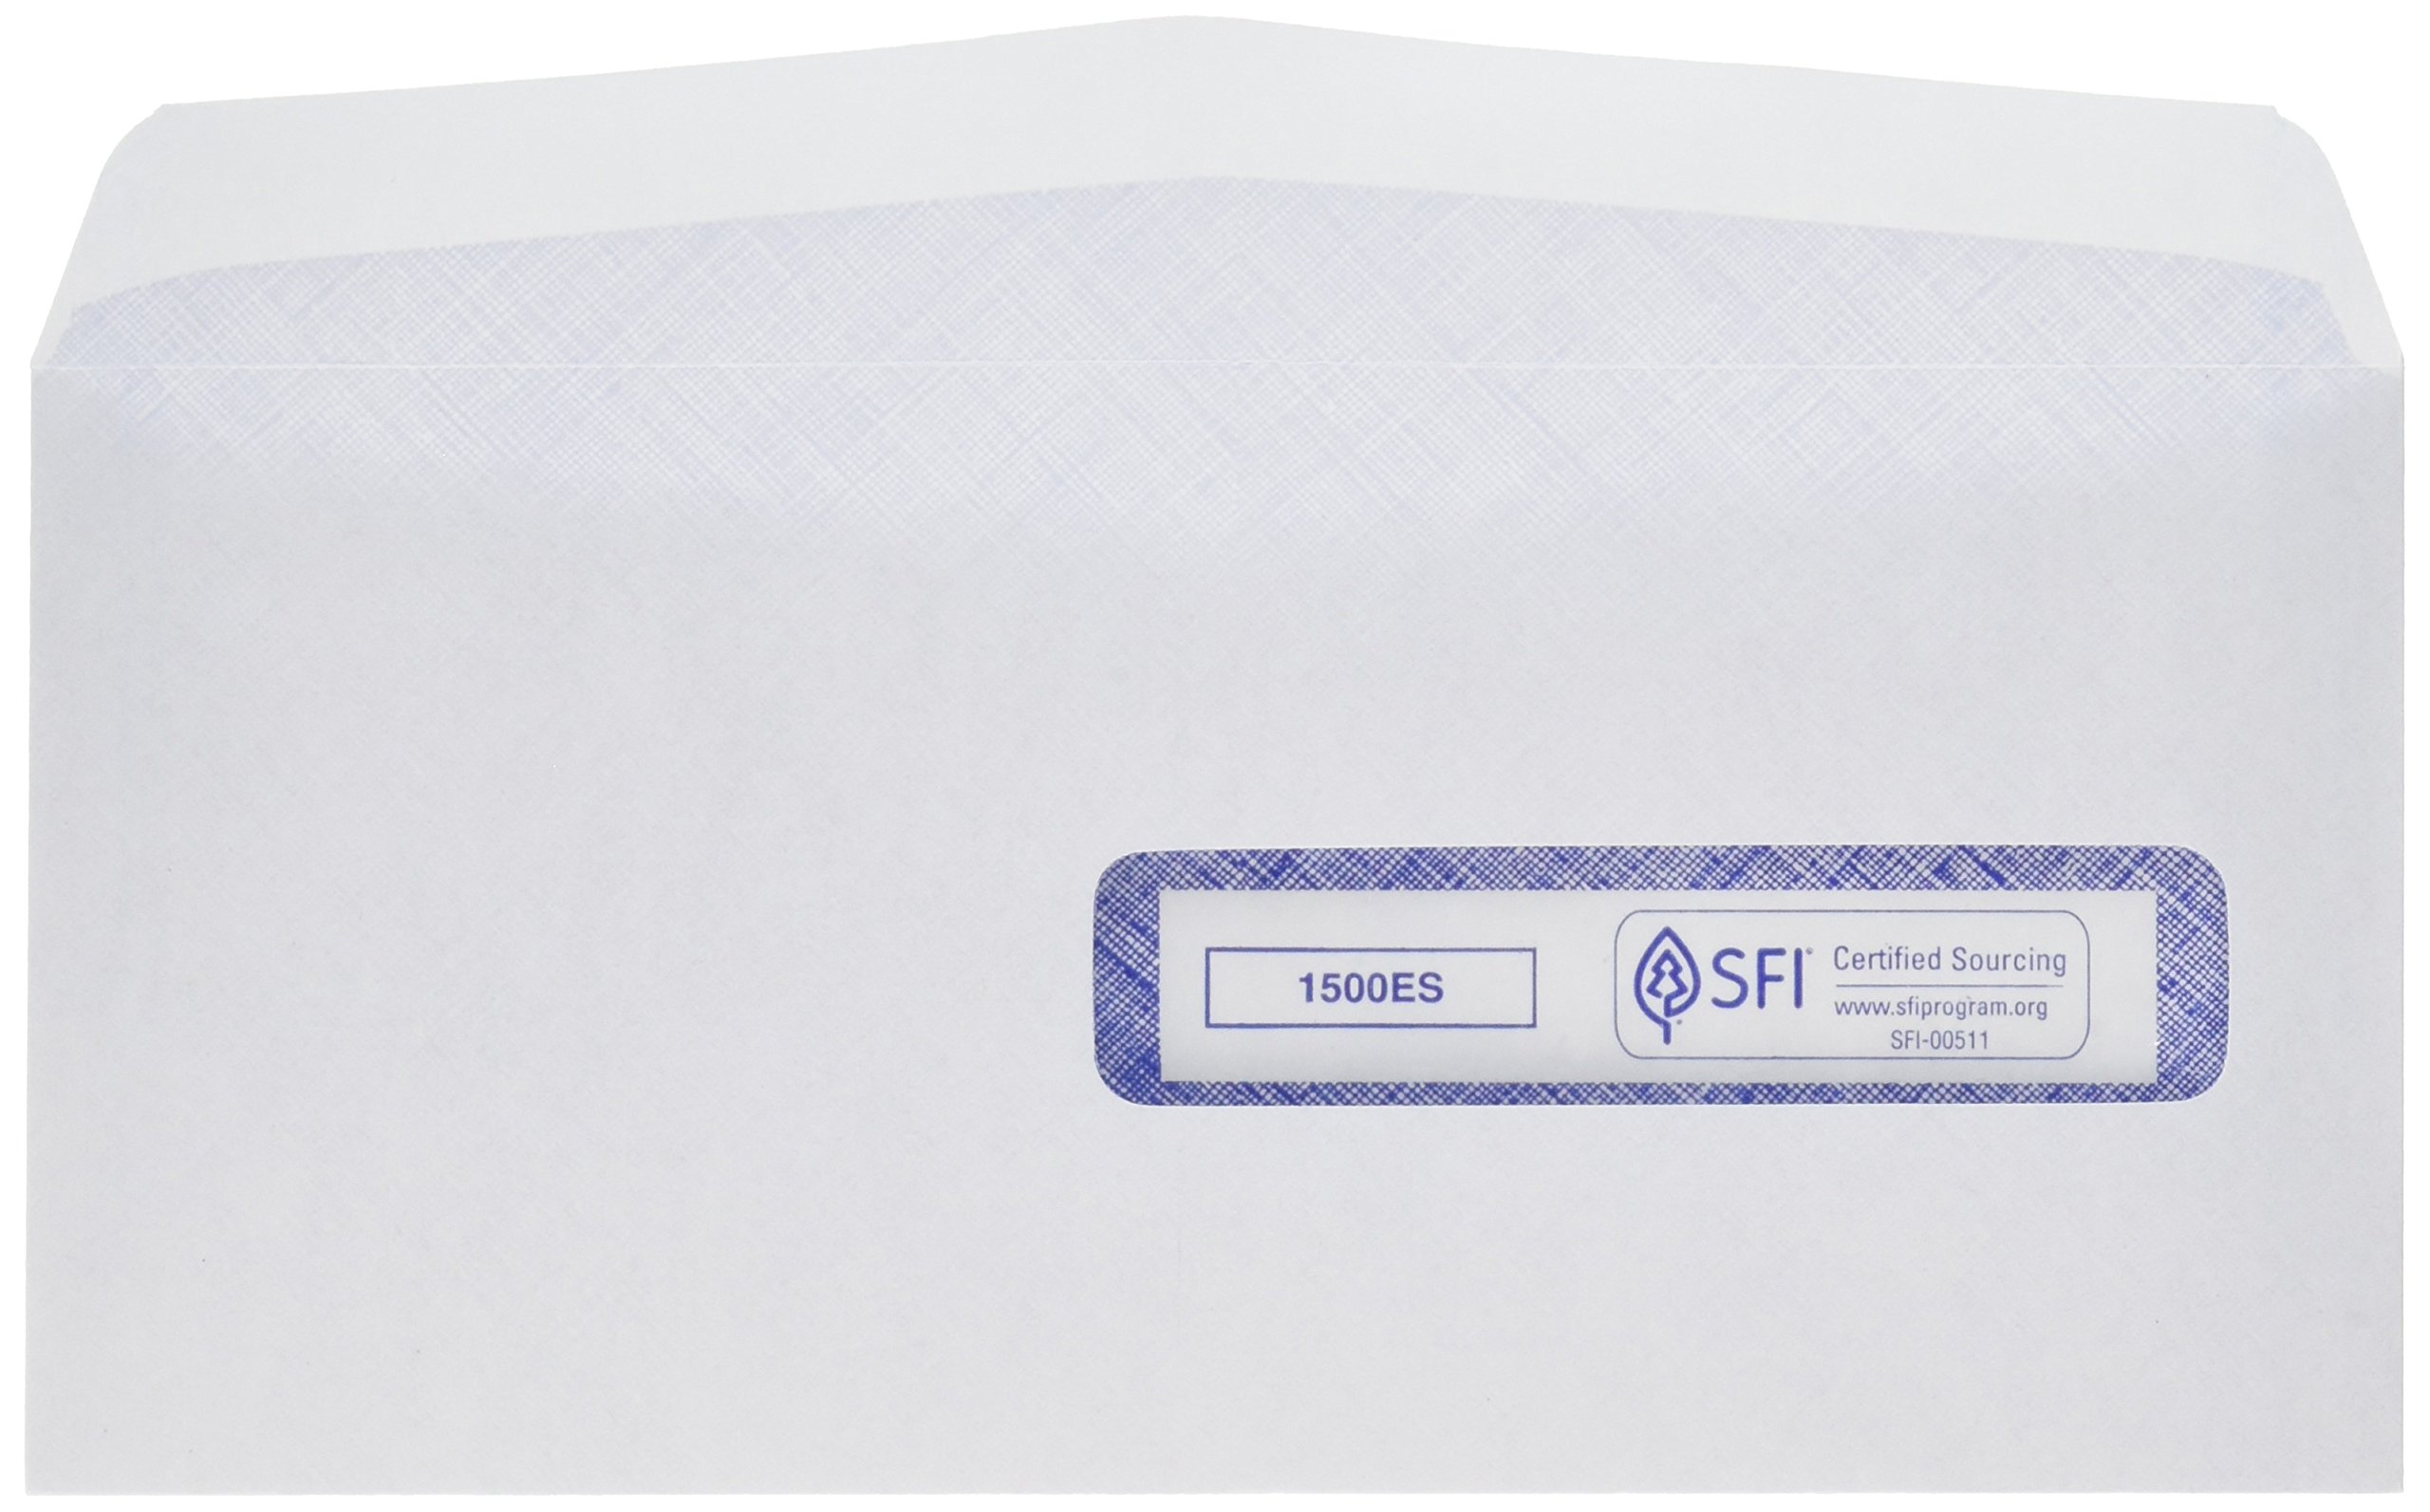 CMS-1500#10-1/2 (4-1/2'' x 9-1/2'') Window Envelope, Self Seal (500/Box)